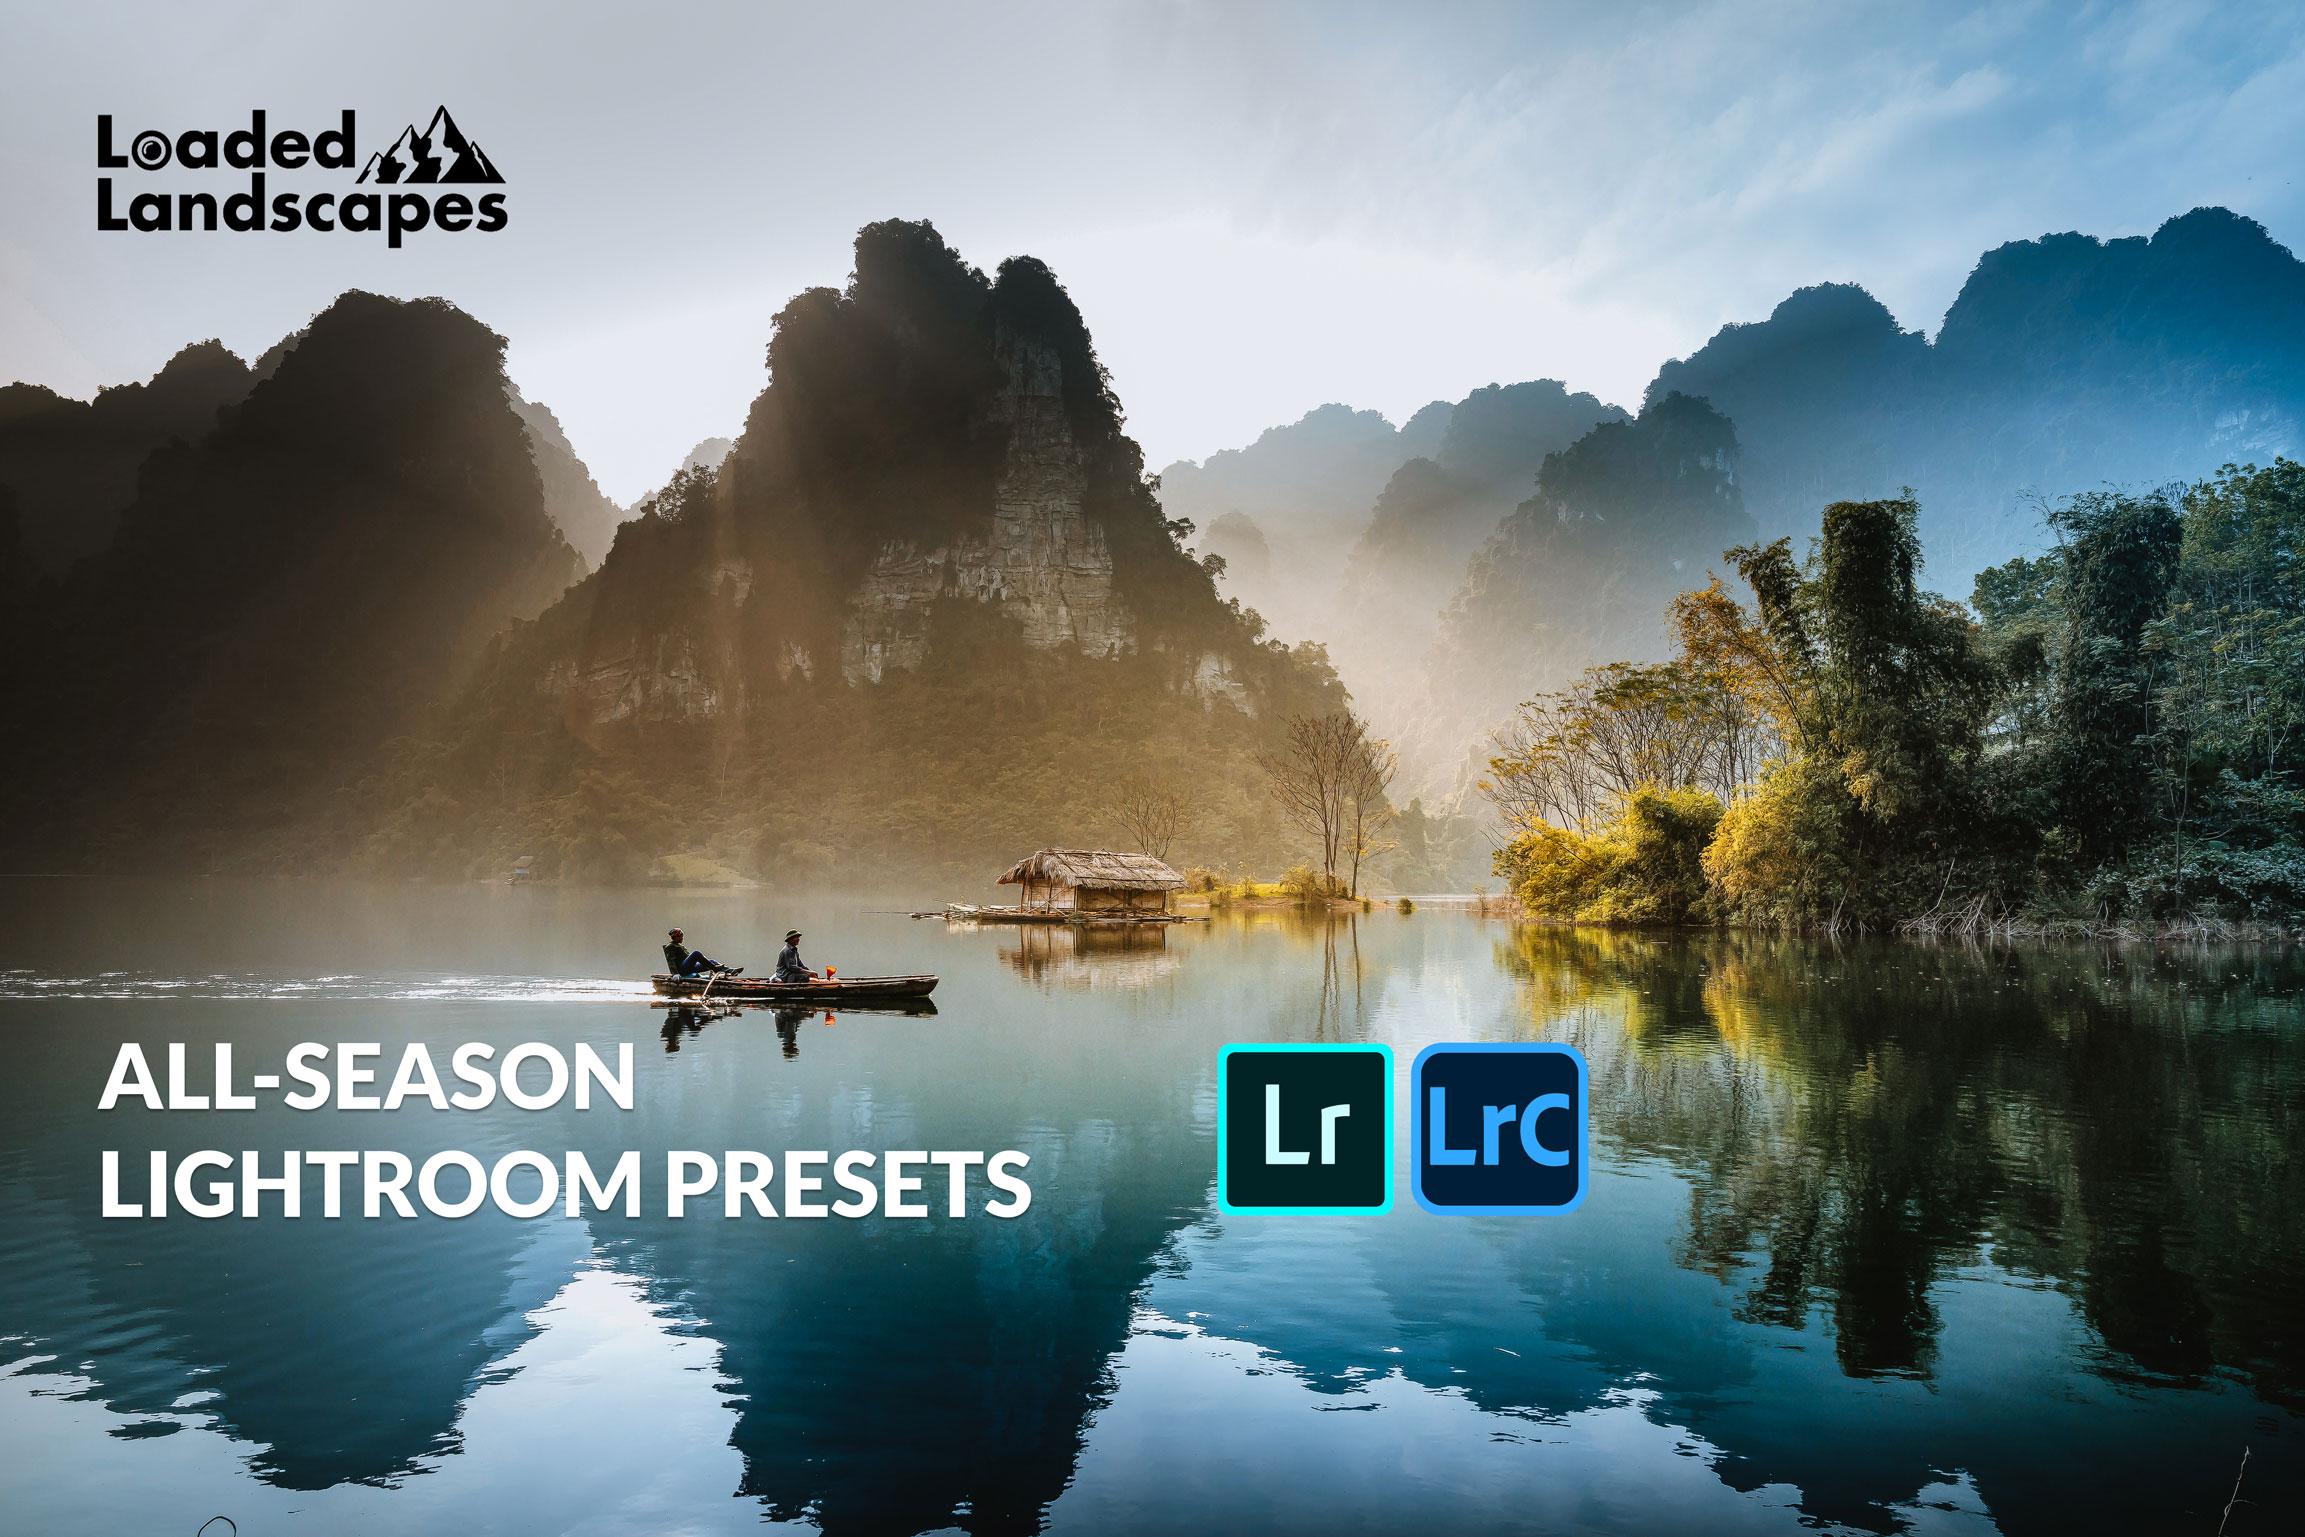 landscape photography, lightroom presets, nature photography, Quang Nguyen Vinh